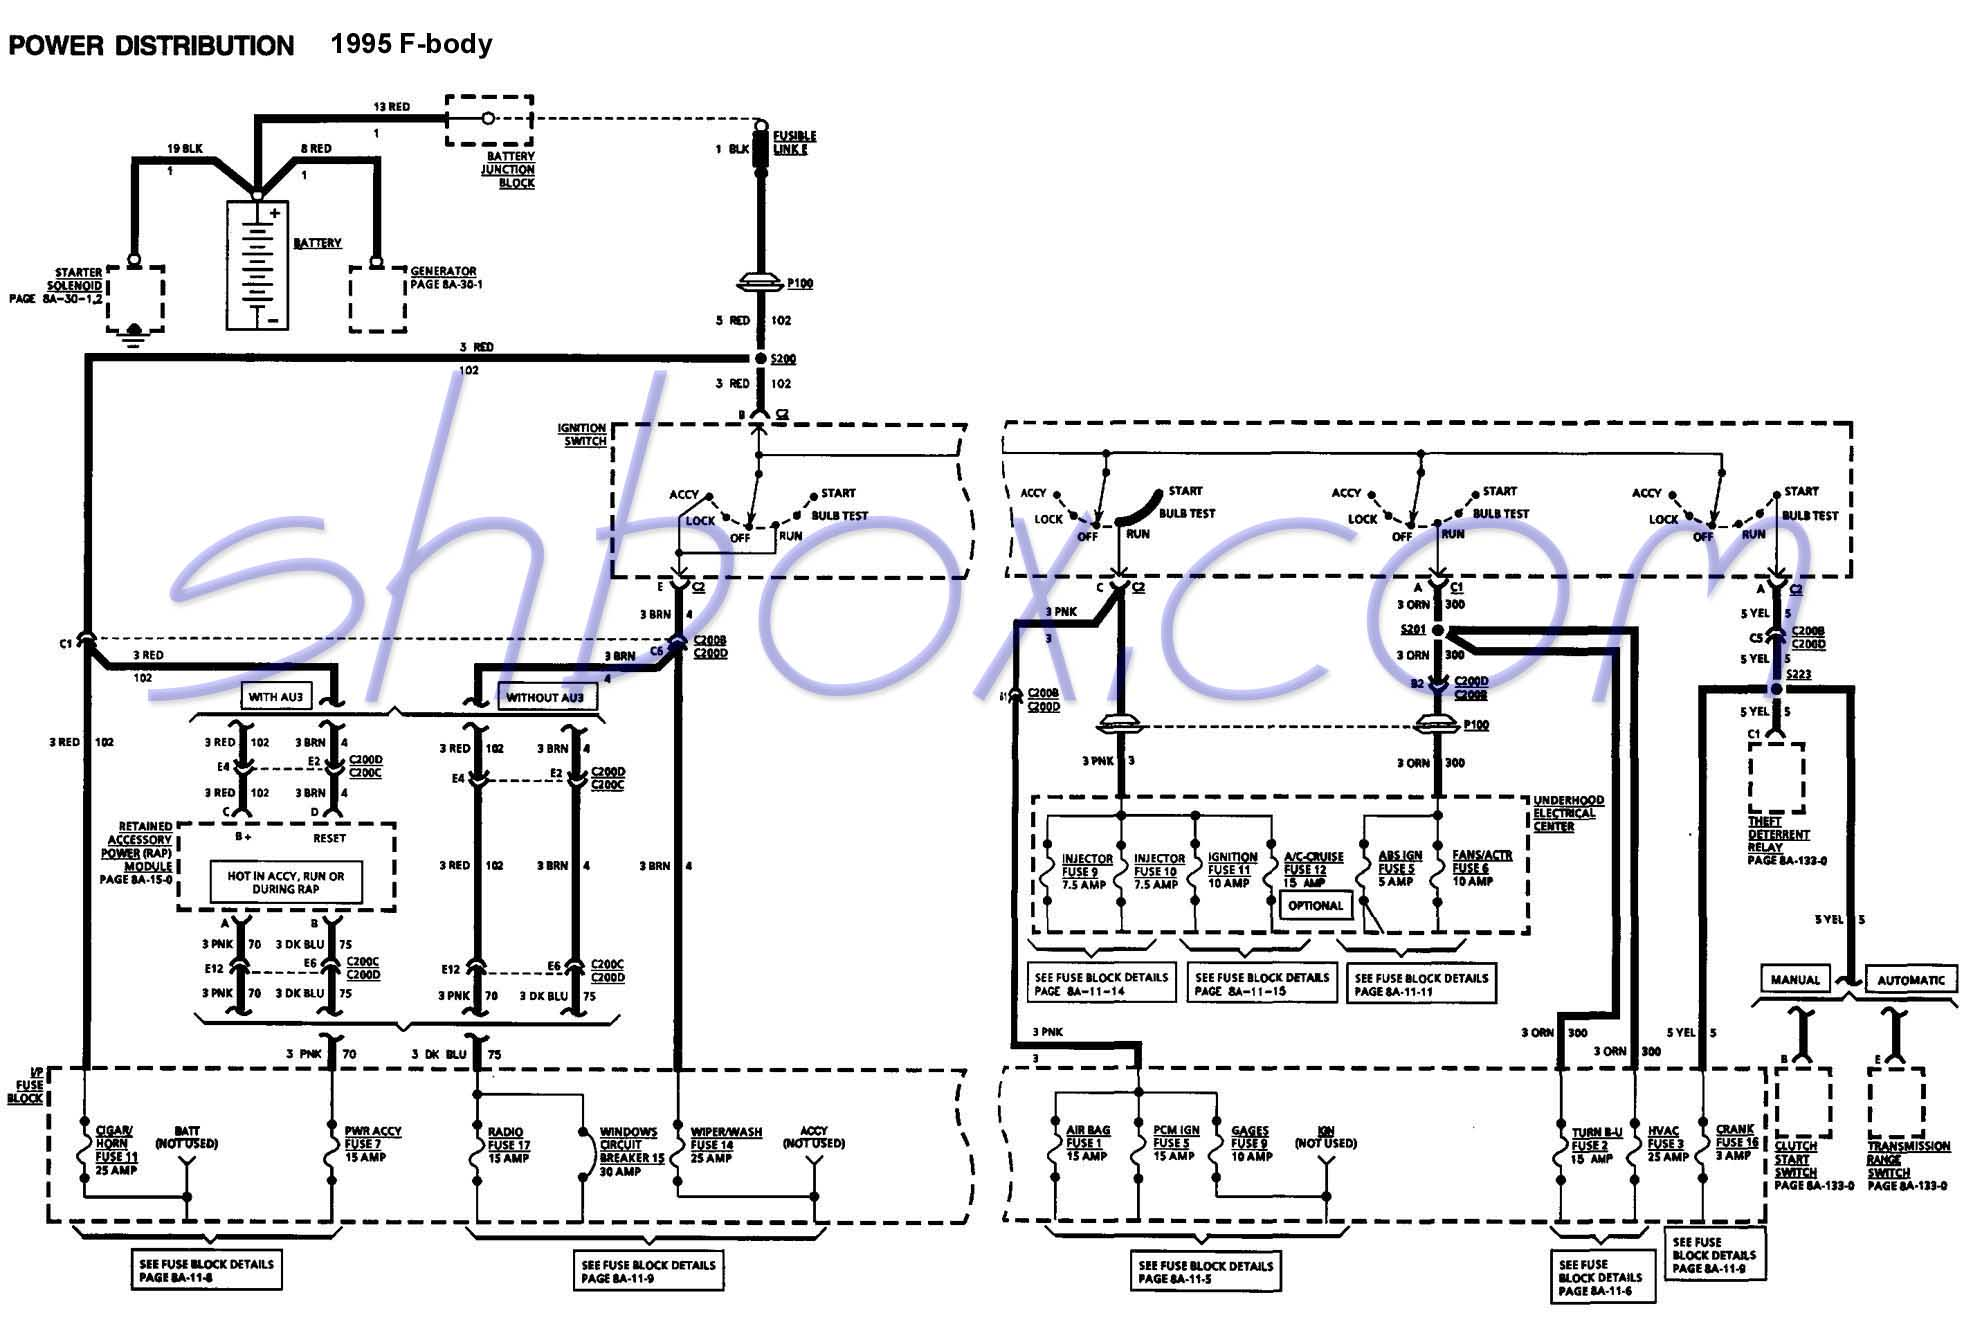 hight resolution of 94 3 4 v6 camaro no spark urgent page 3 camaro 85 camaro steering column diagram stop light wiring diagram 1967 camaro